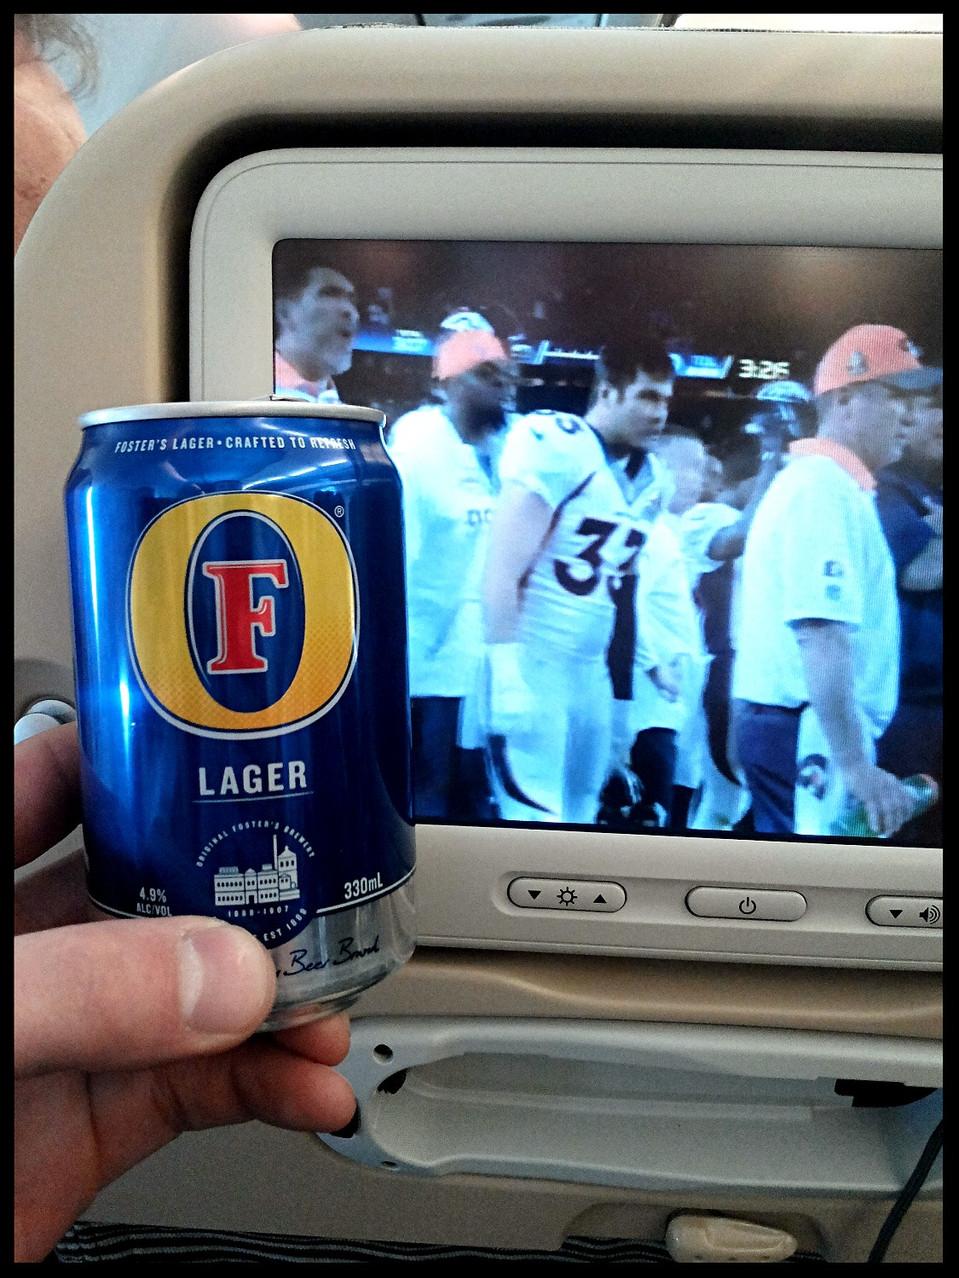 Beer and Football on flight